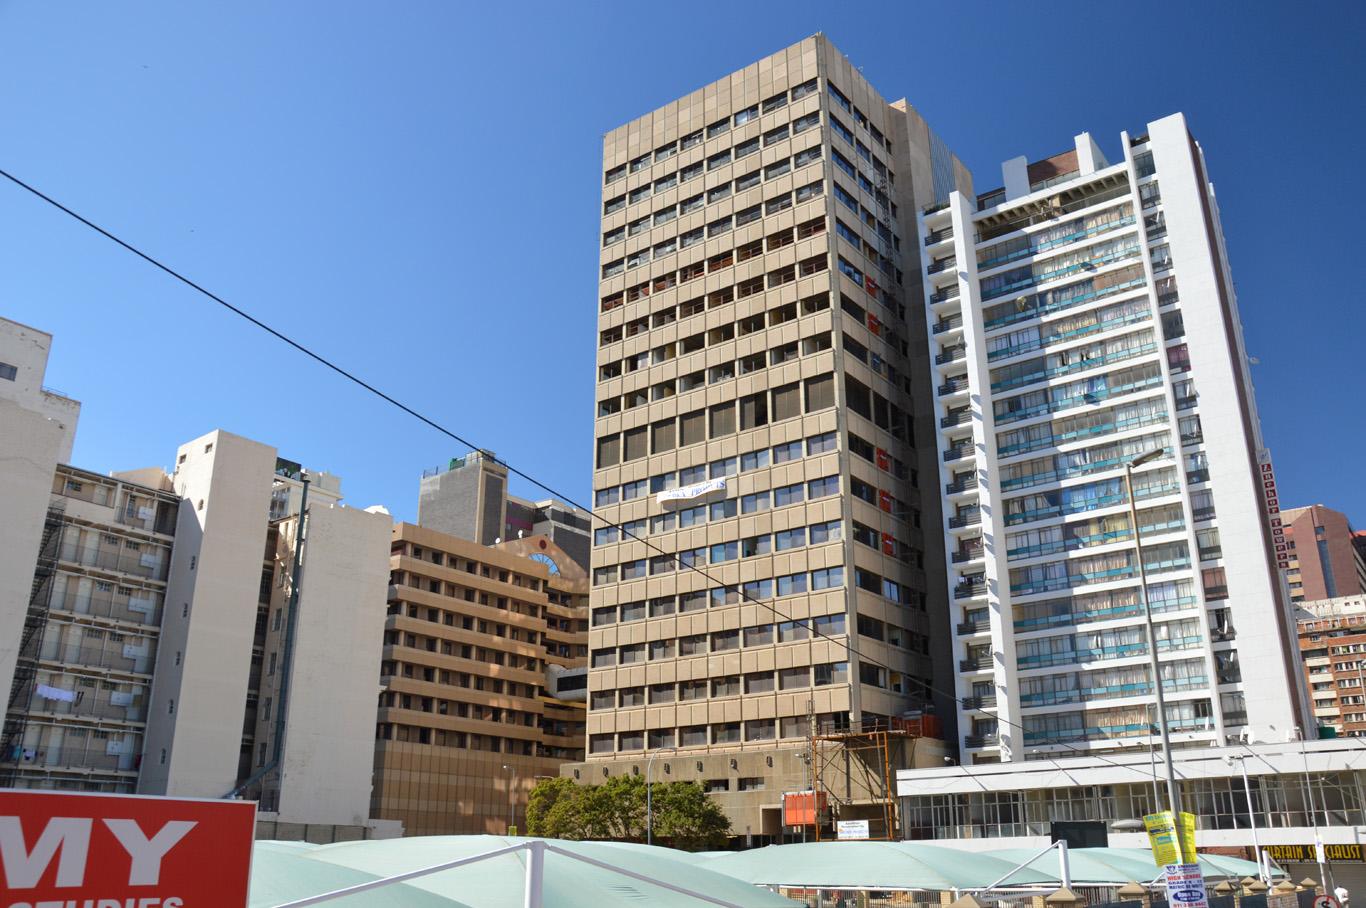 Buildings in Johannesburg